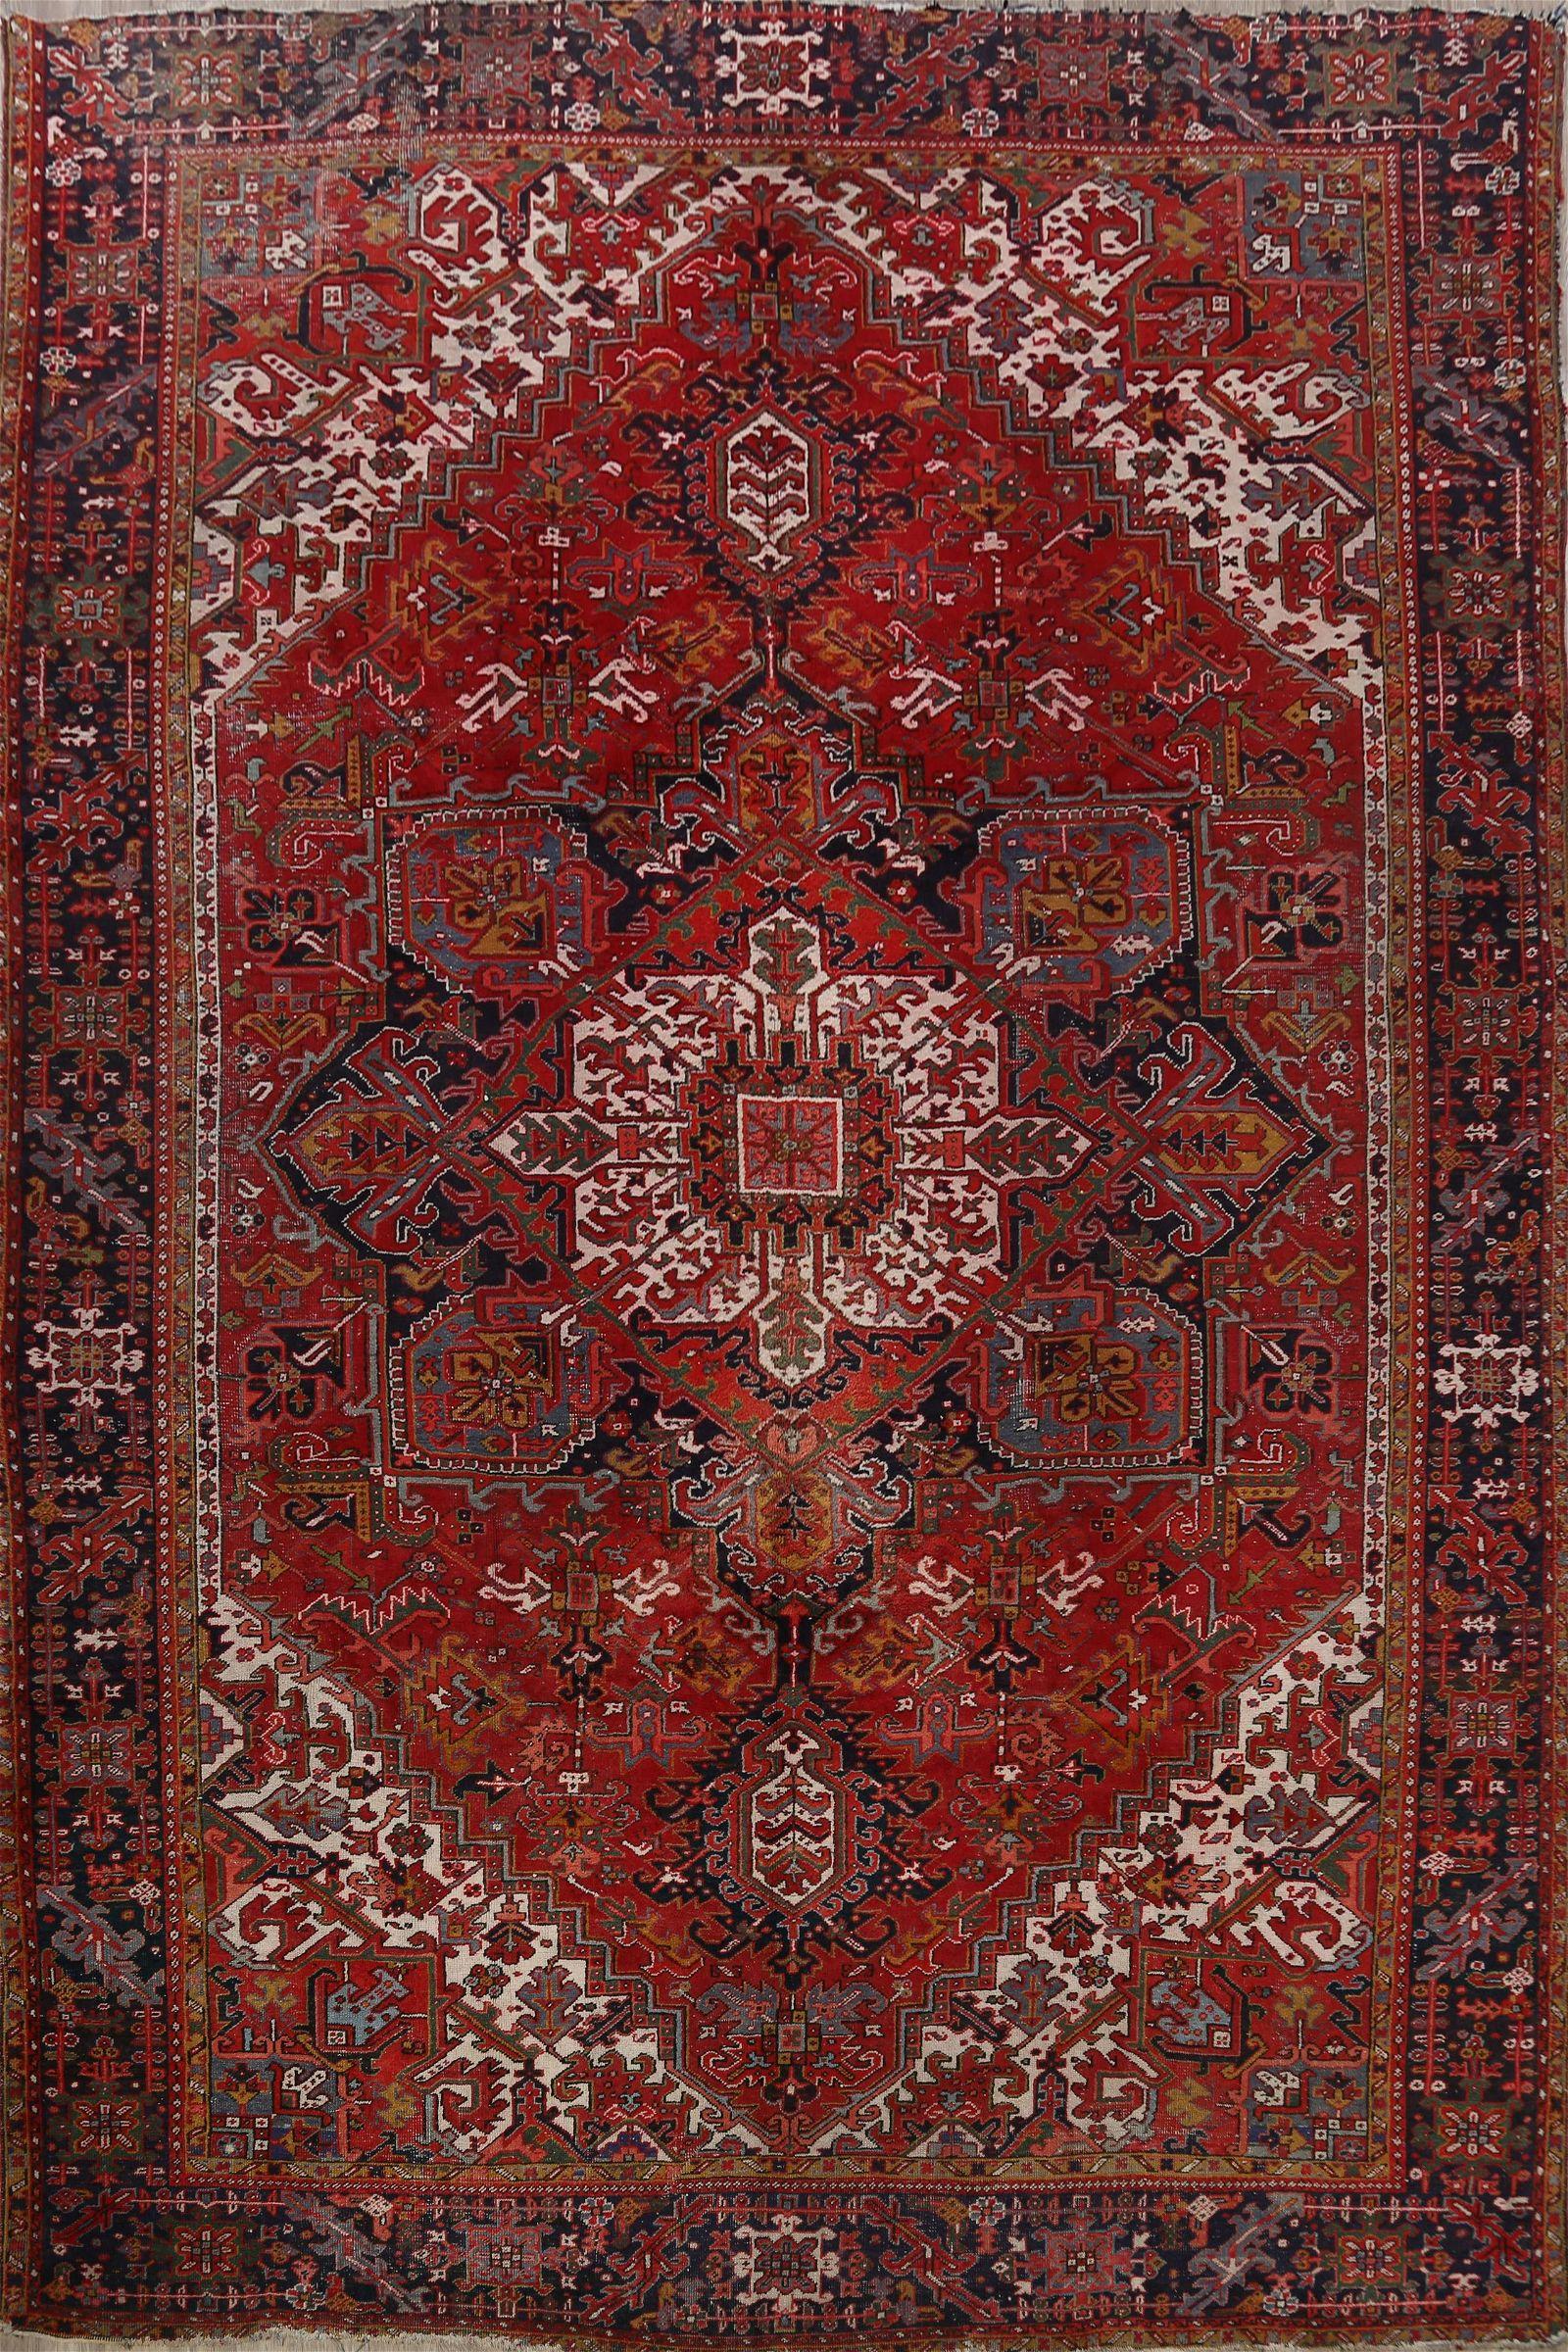 Antique Geometric Heriz Persian Area Rug 12x15 Large